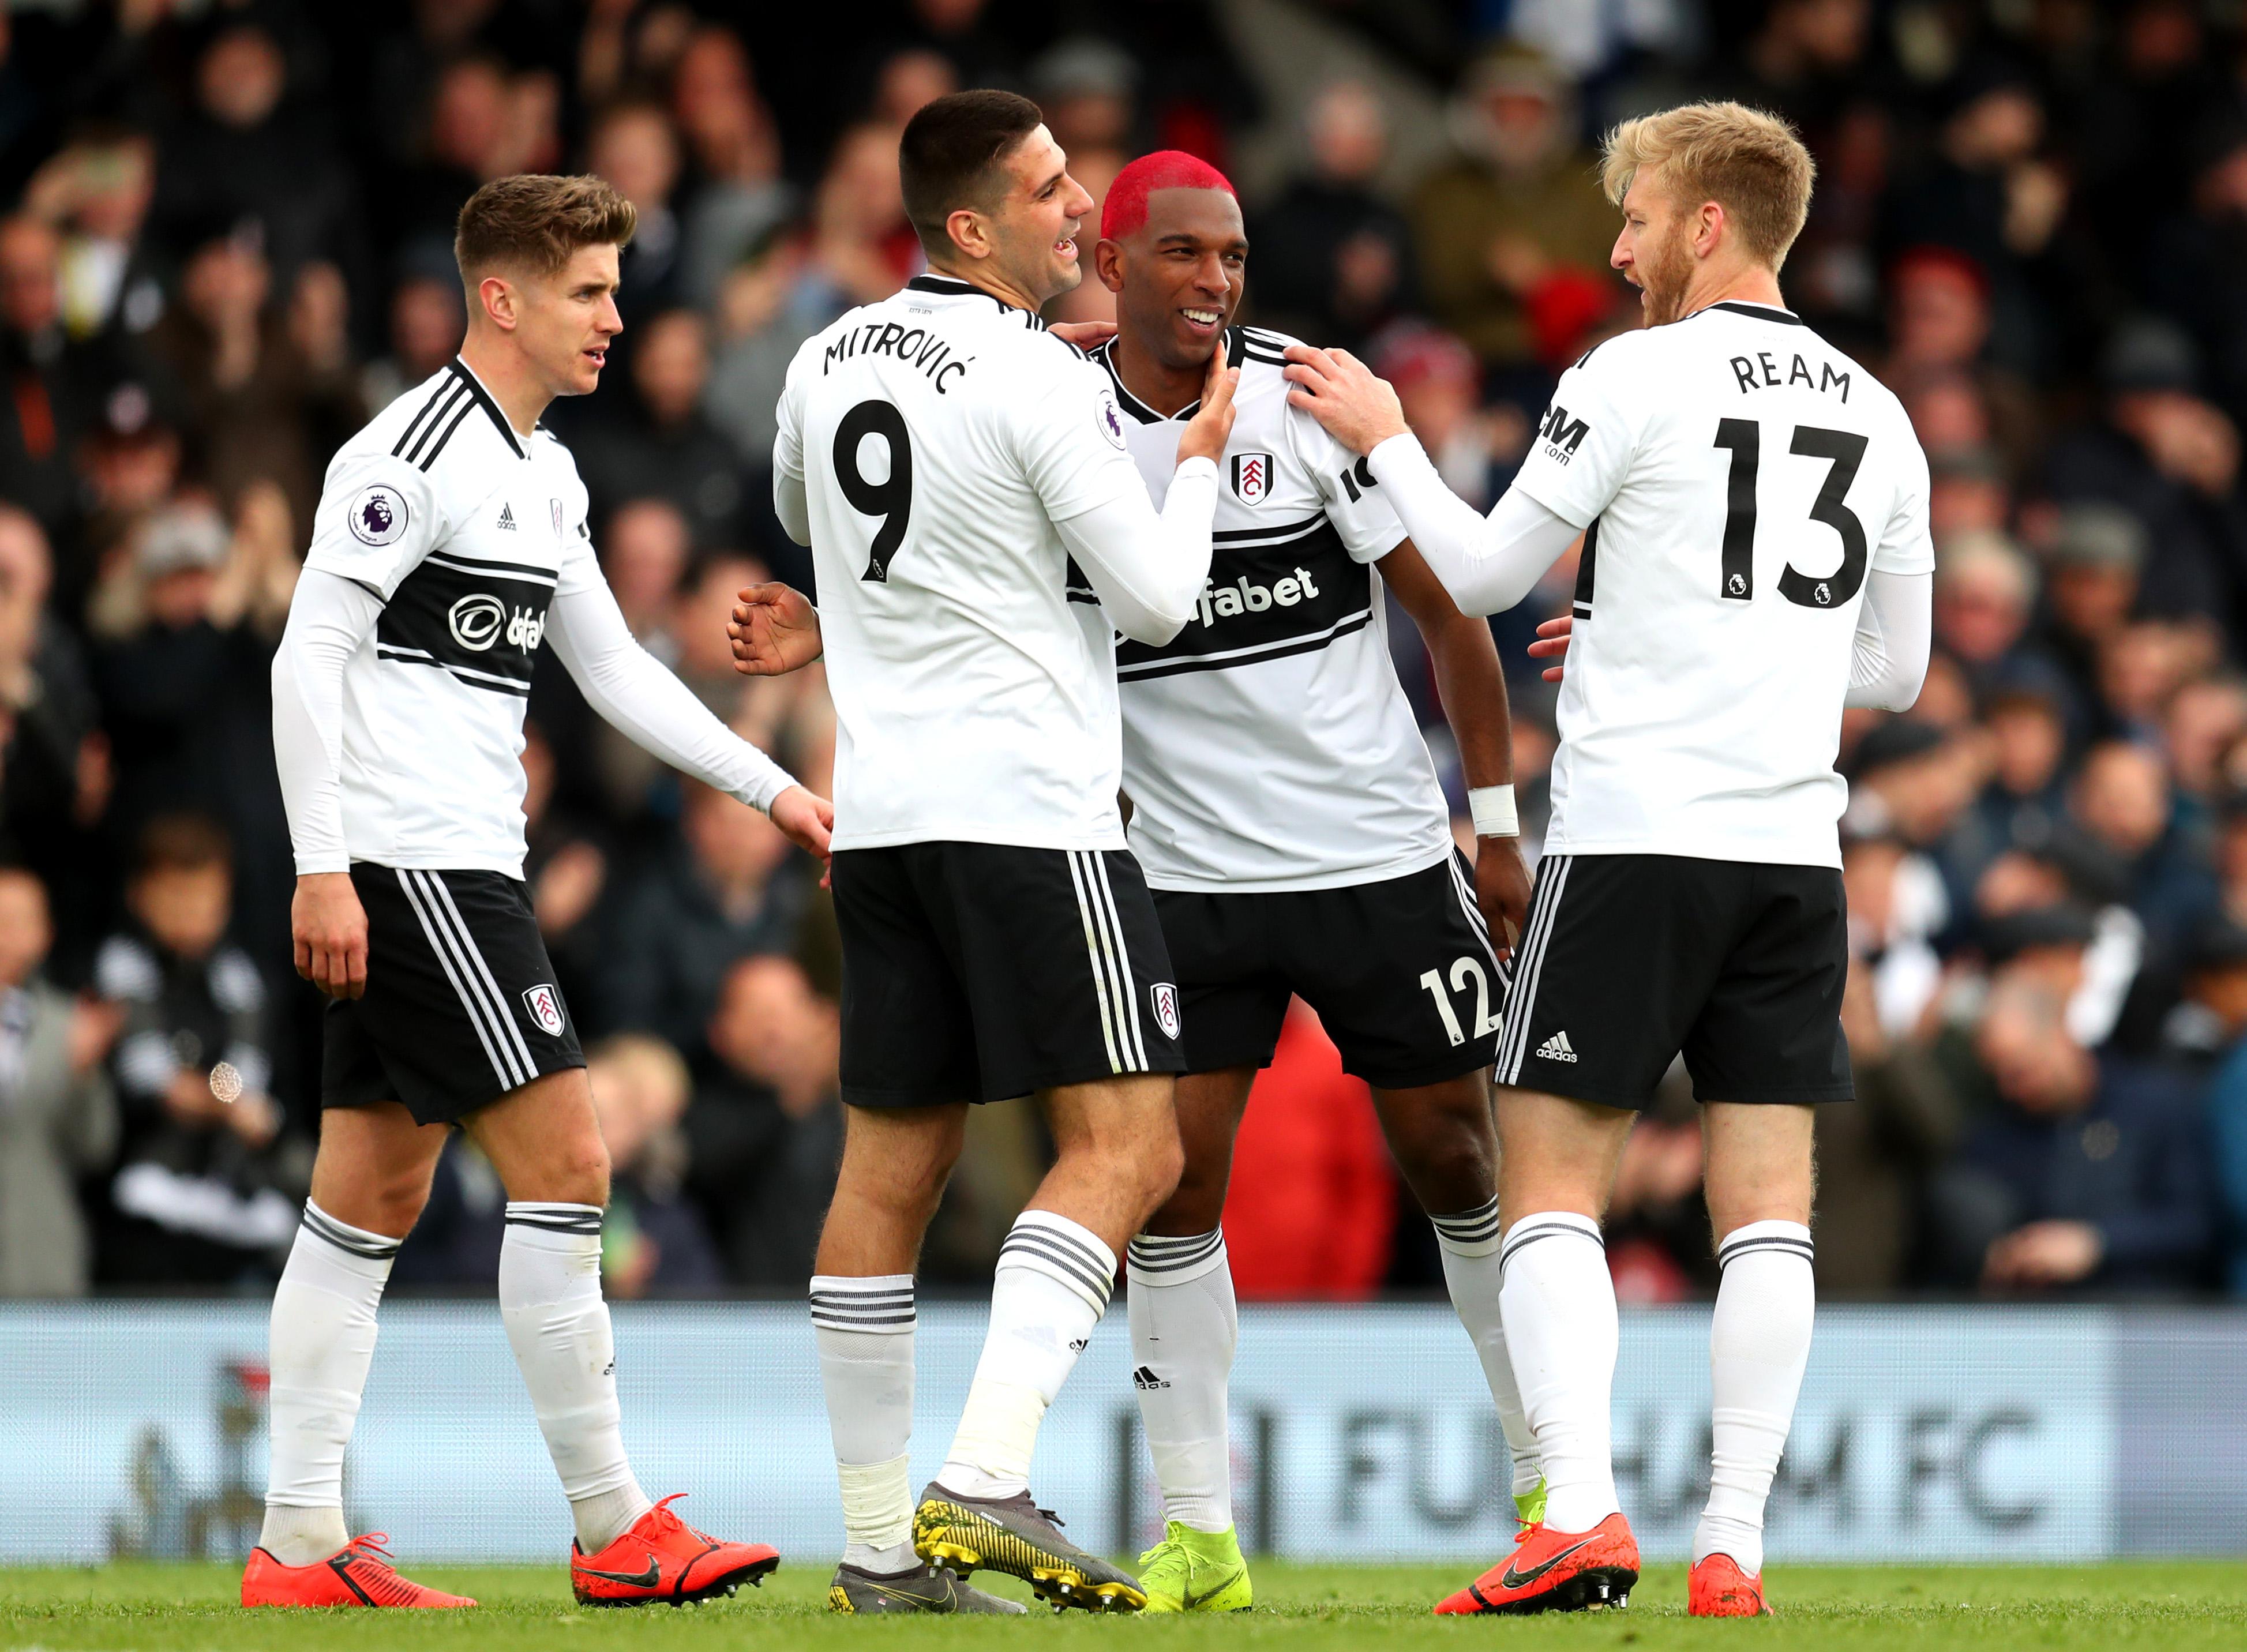 Fulham FC v Cardiff City - Premier League